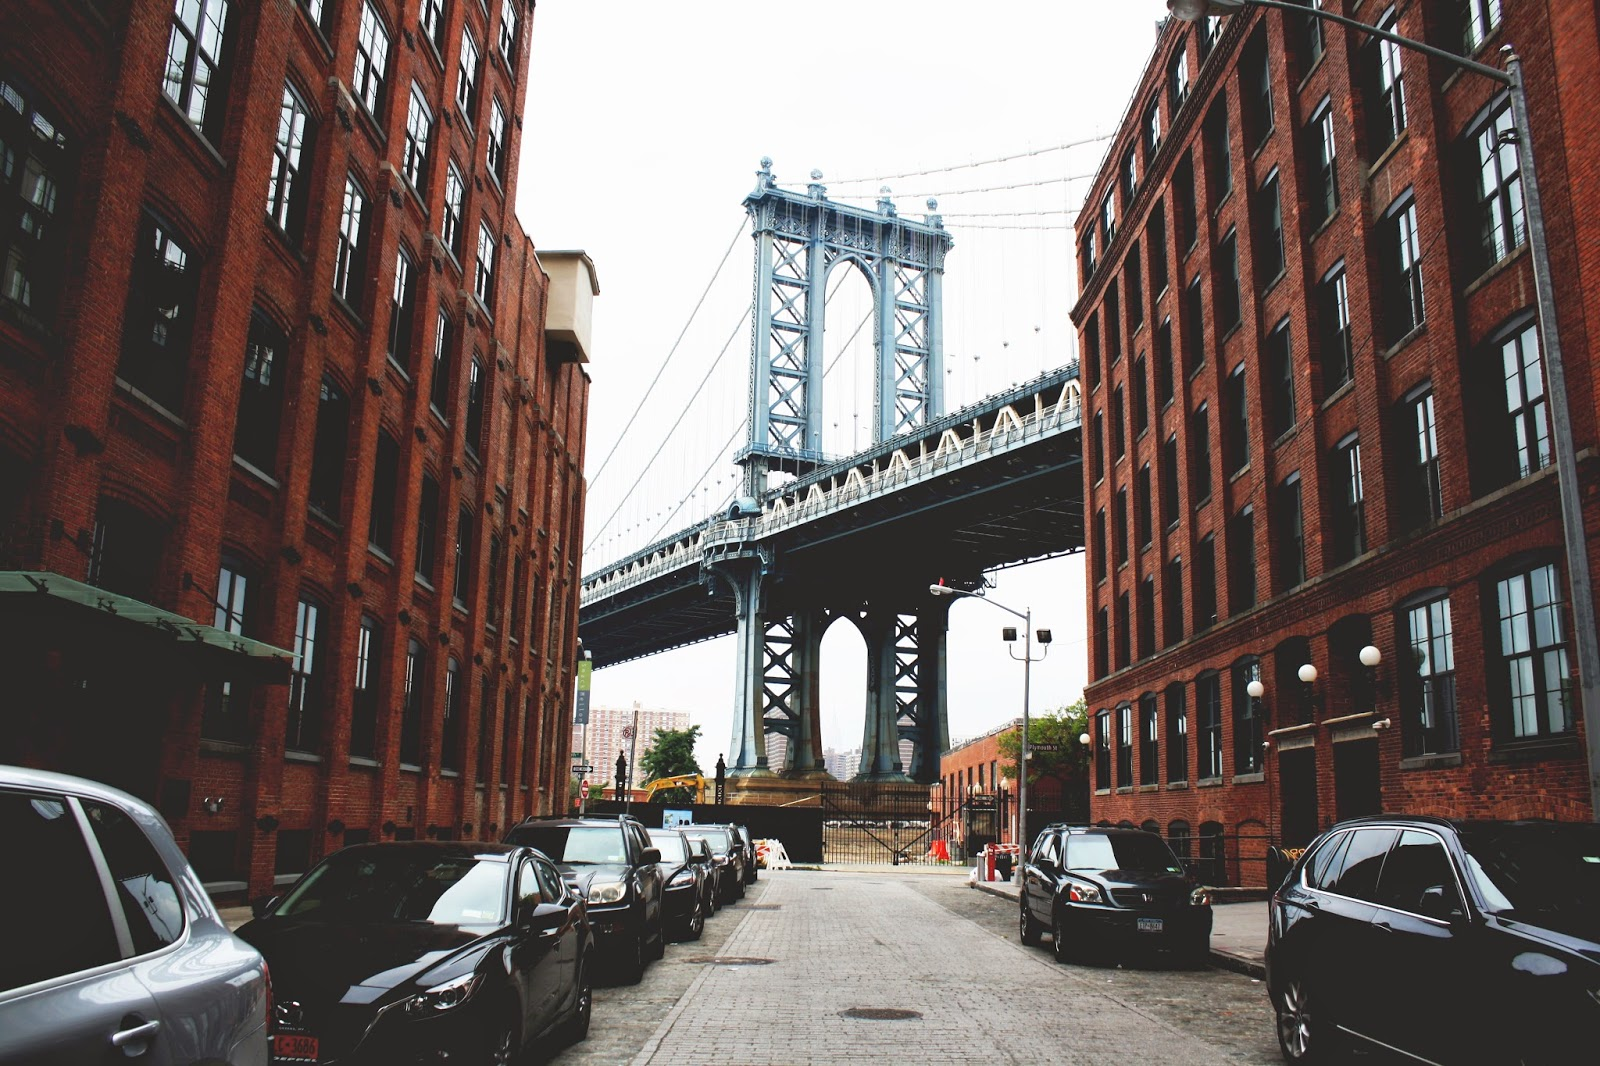 dumbo brooklyn new york city impepevelablog. Black Bedroom Furniture Sets. Home Design Ideas